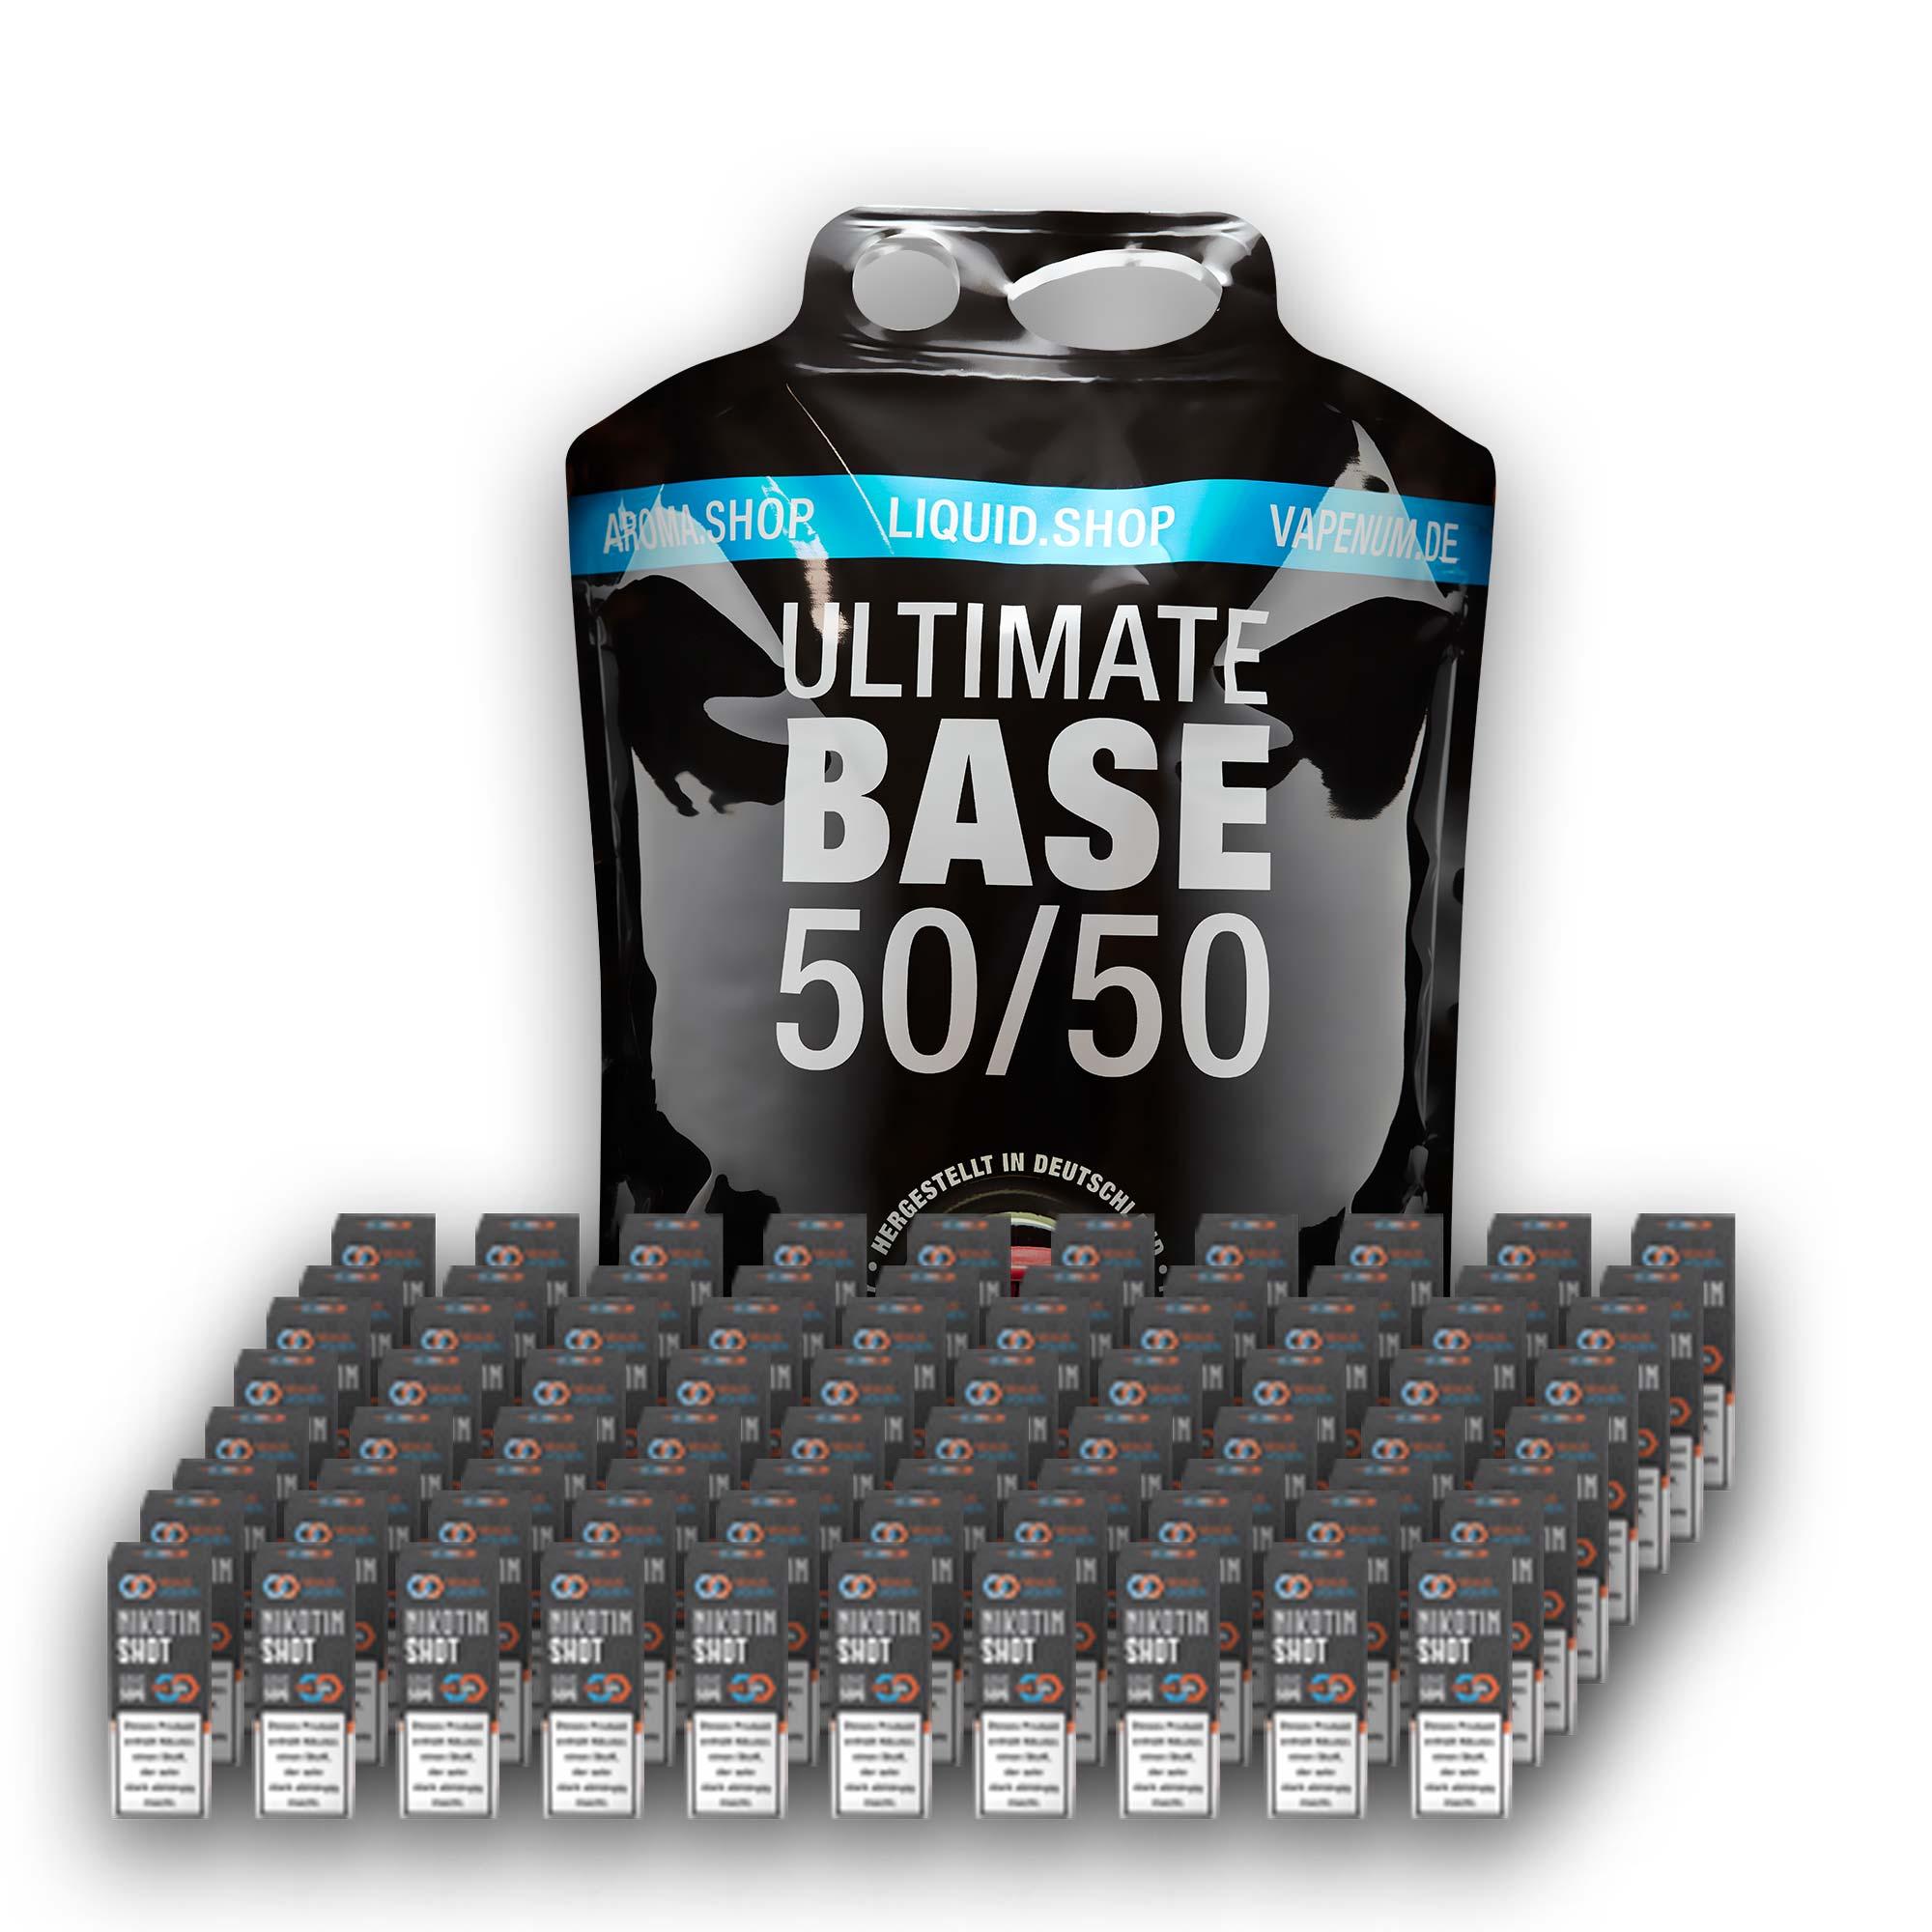 3L Ultimate Base (50/50) inklusive 80 Nik Shots 18mg